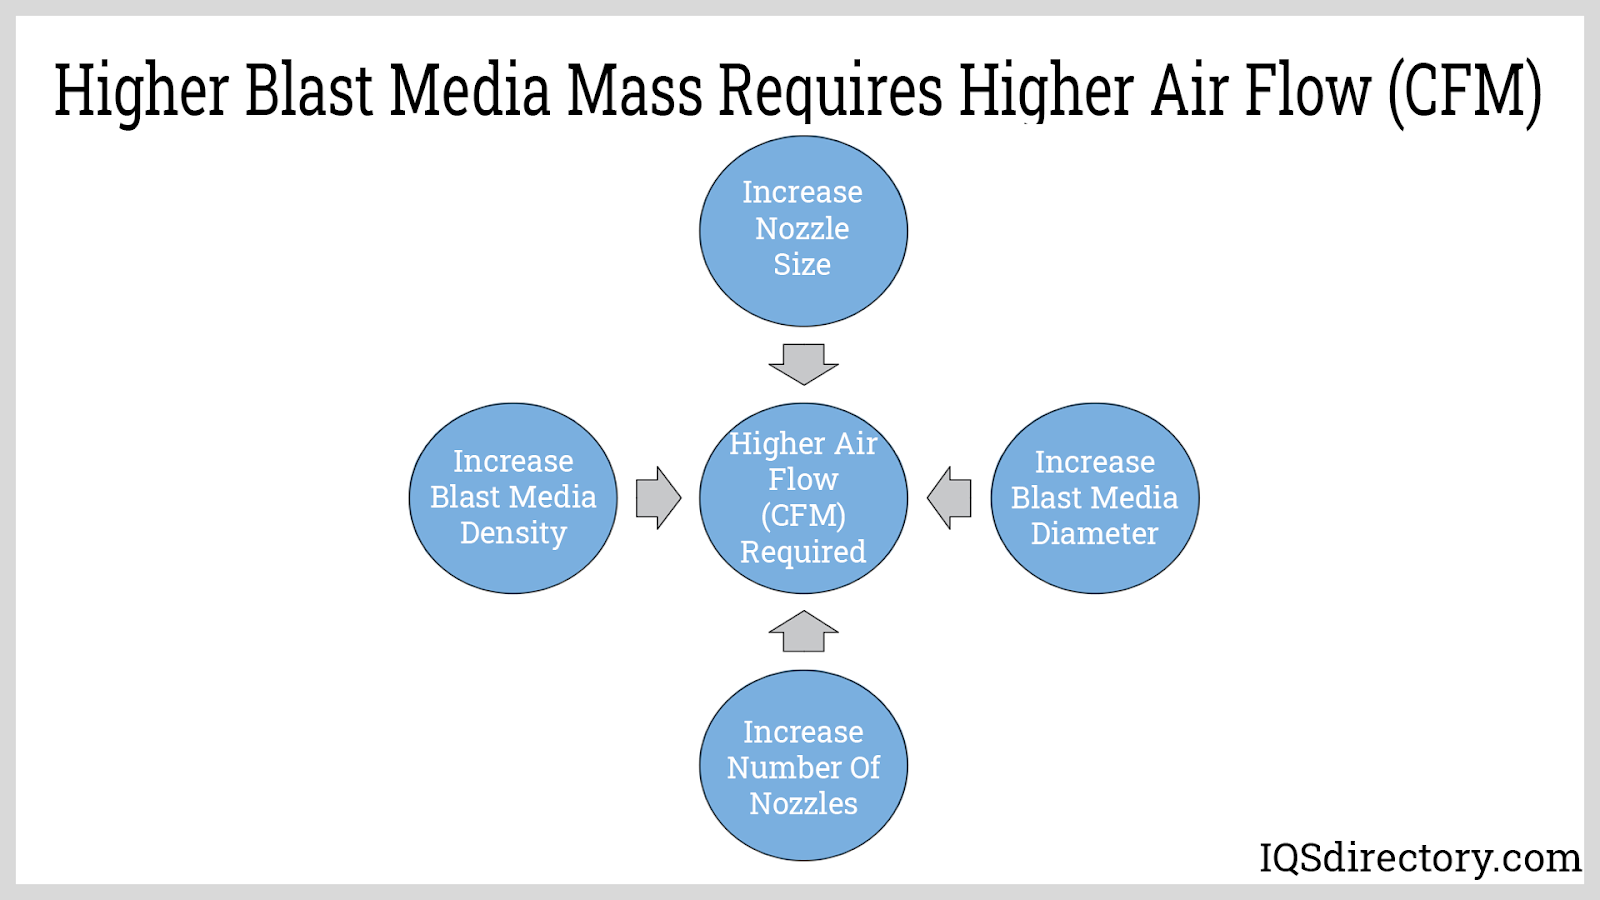 Higher Blast Media Mass Requires Higher Air Flow (CFM)